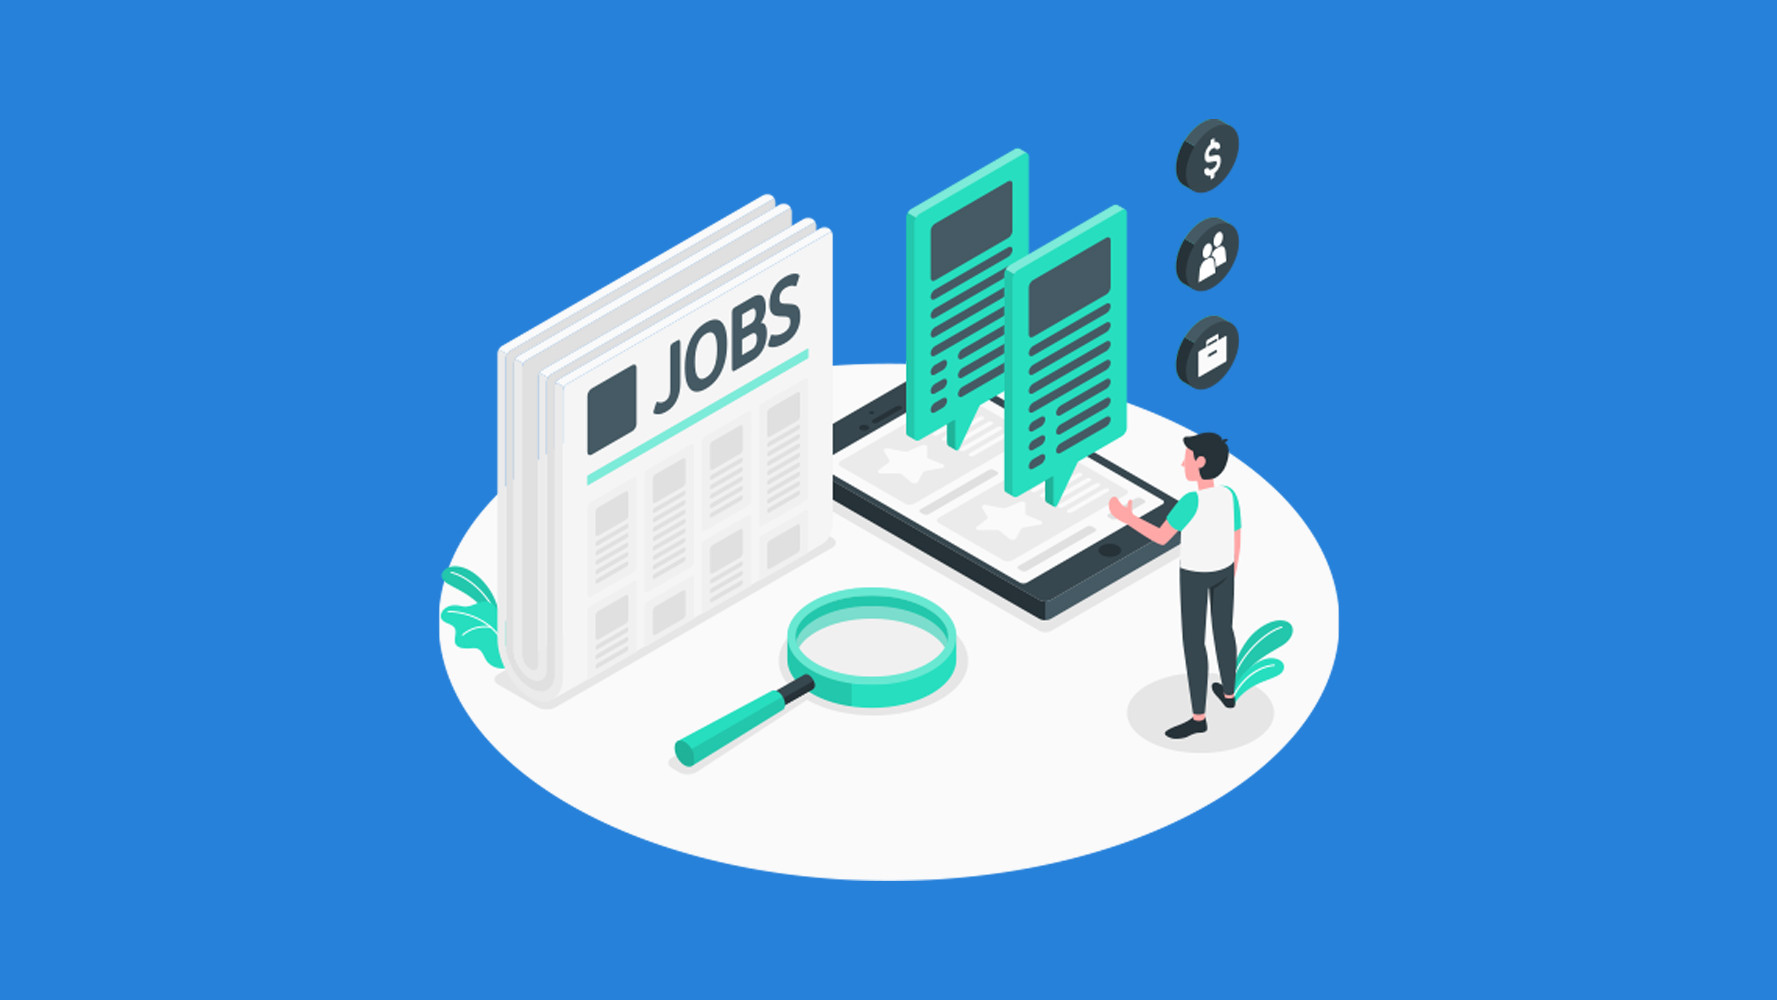 cpa canada accounting consultant contractor accountants recruitment agencies toronto